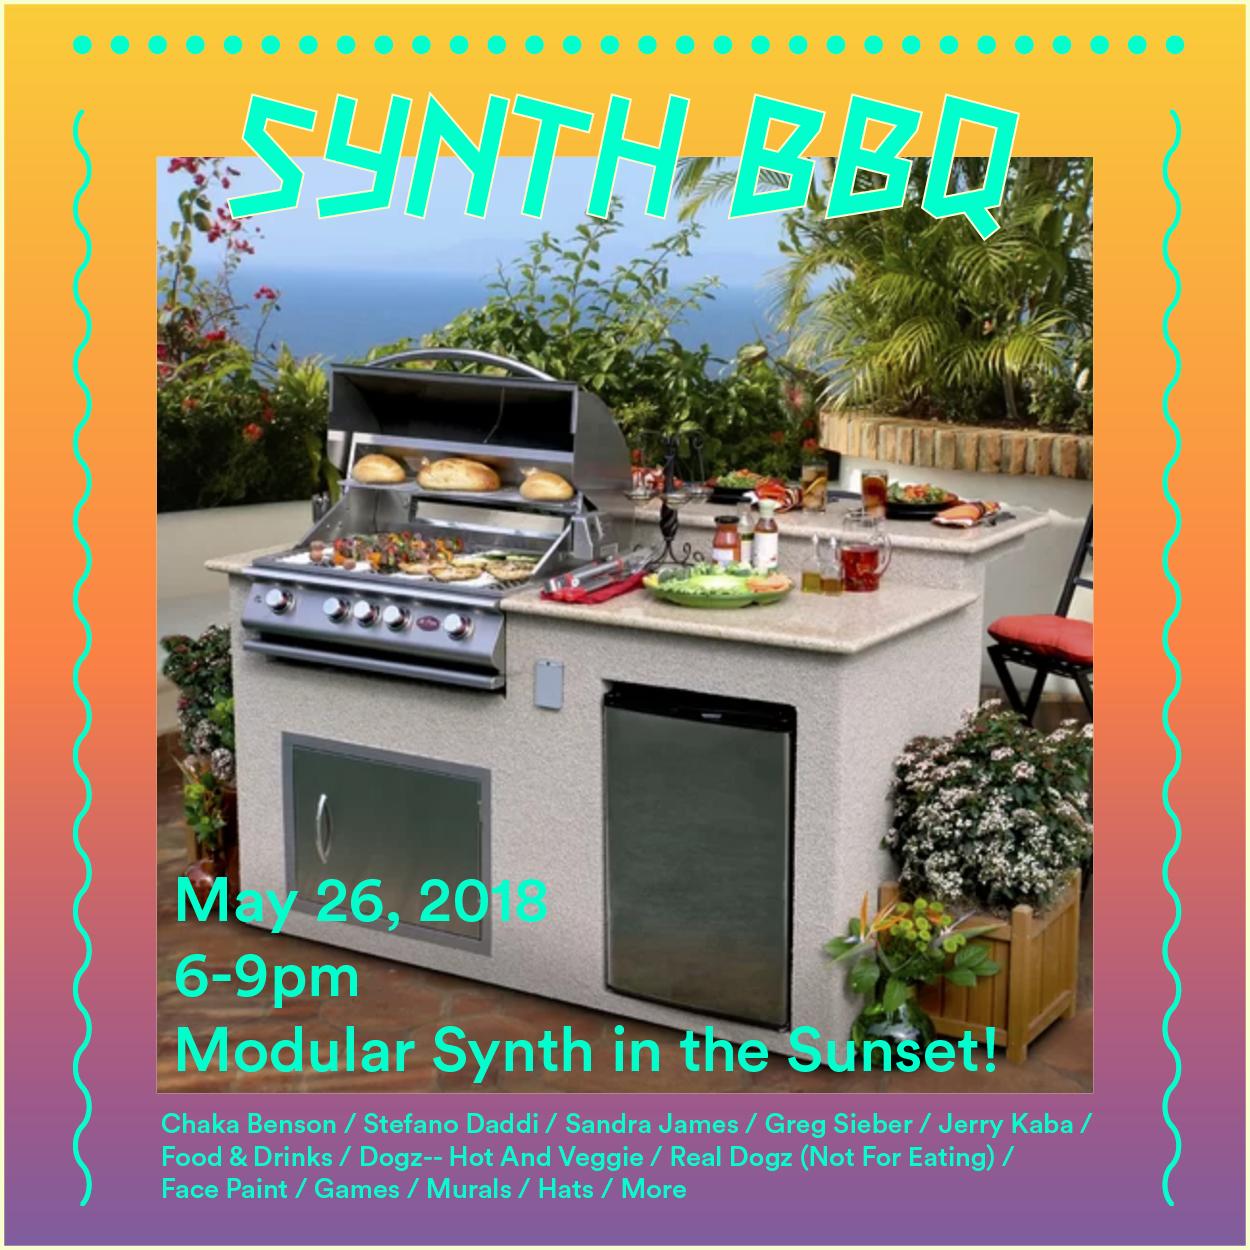 synth-BBQ-FLIER-update.jpg